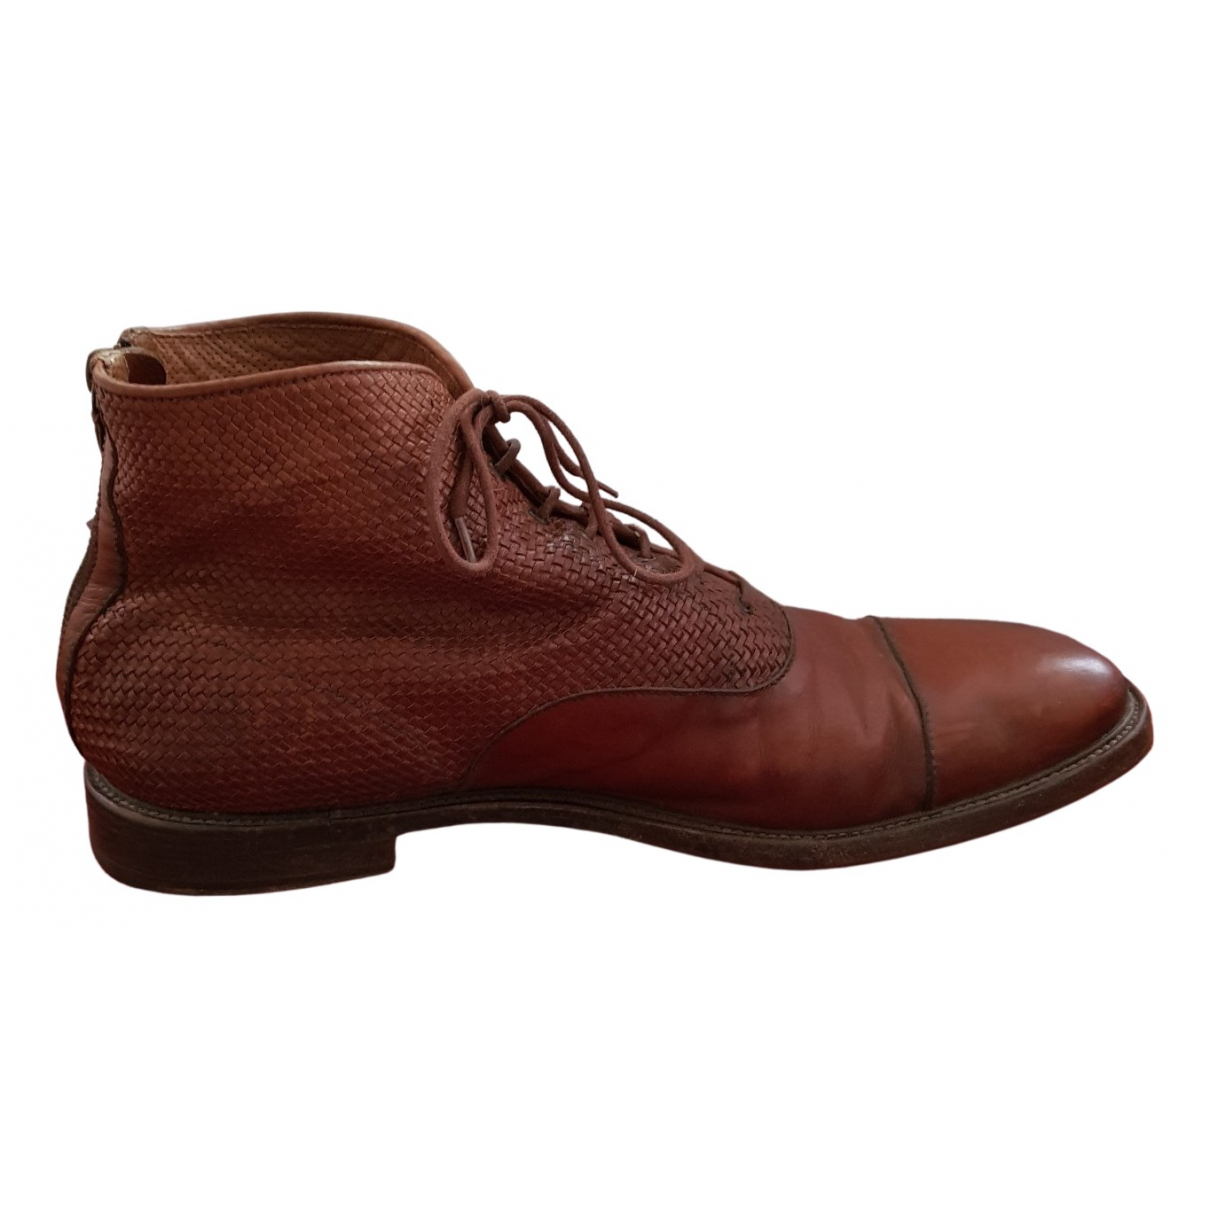 Fratelli Rossetti \N Stiefel in  Braun Leder